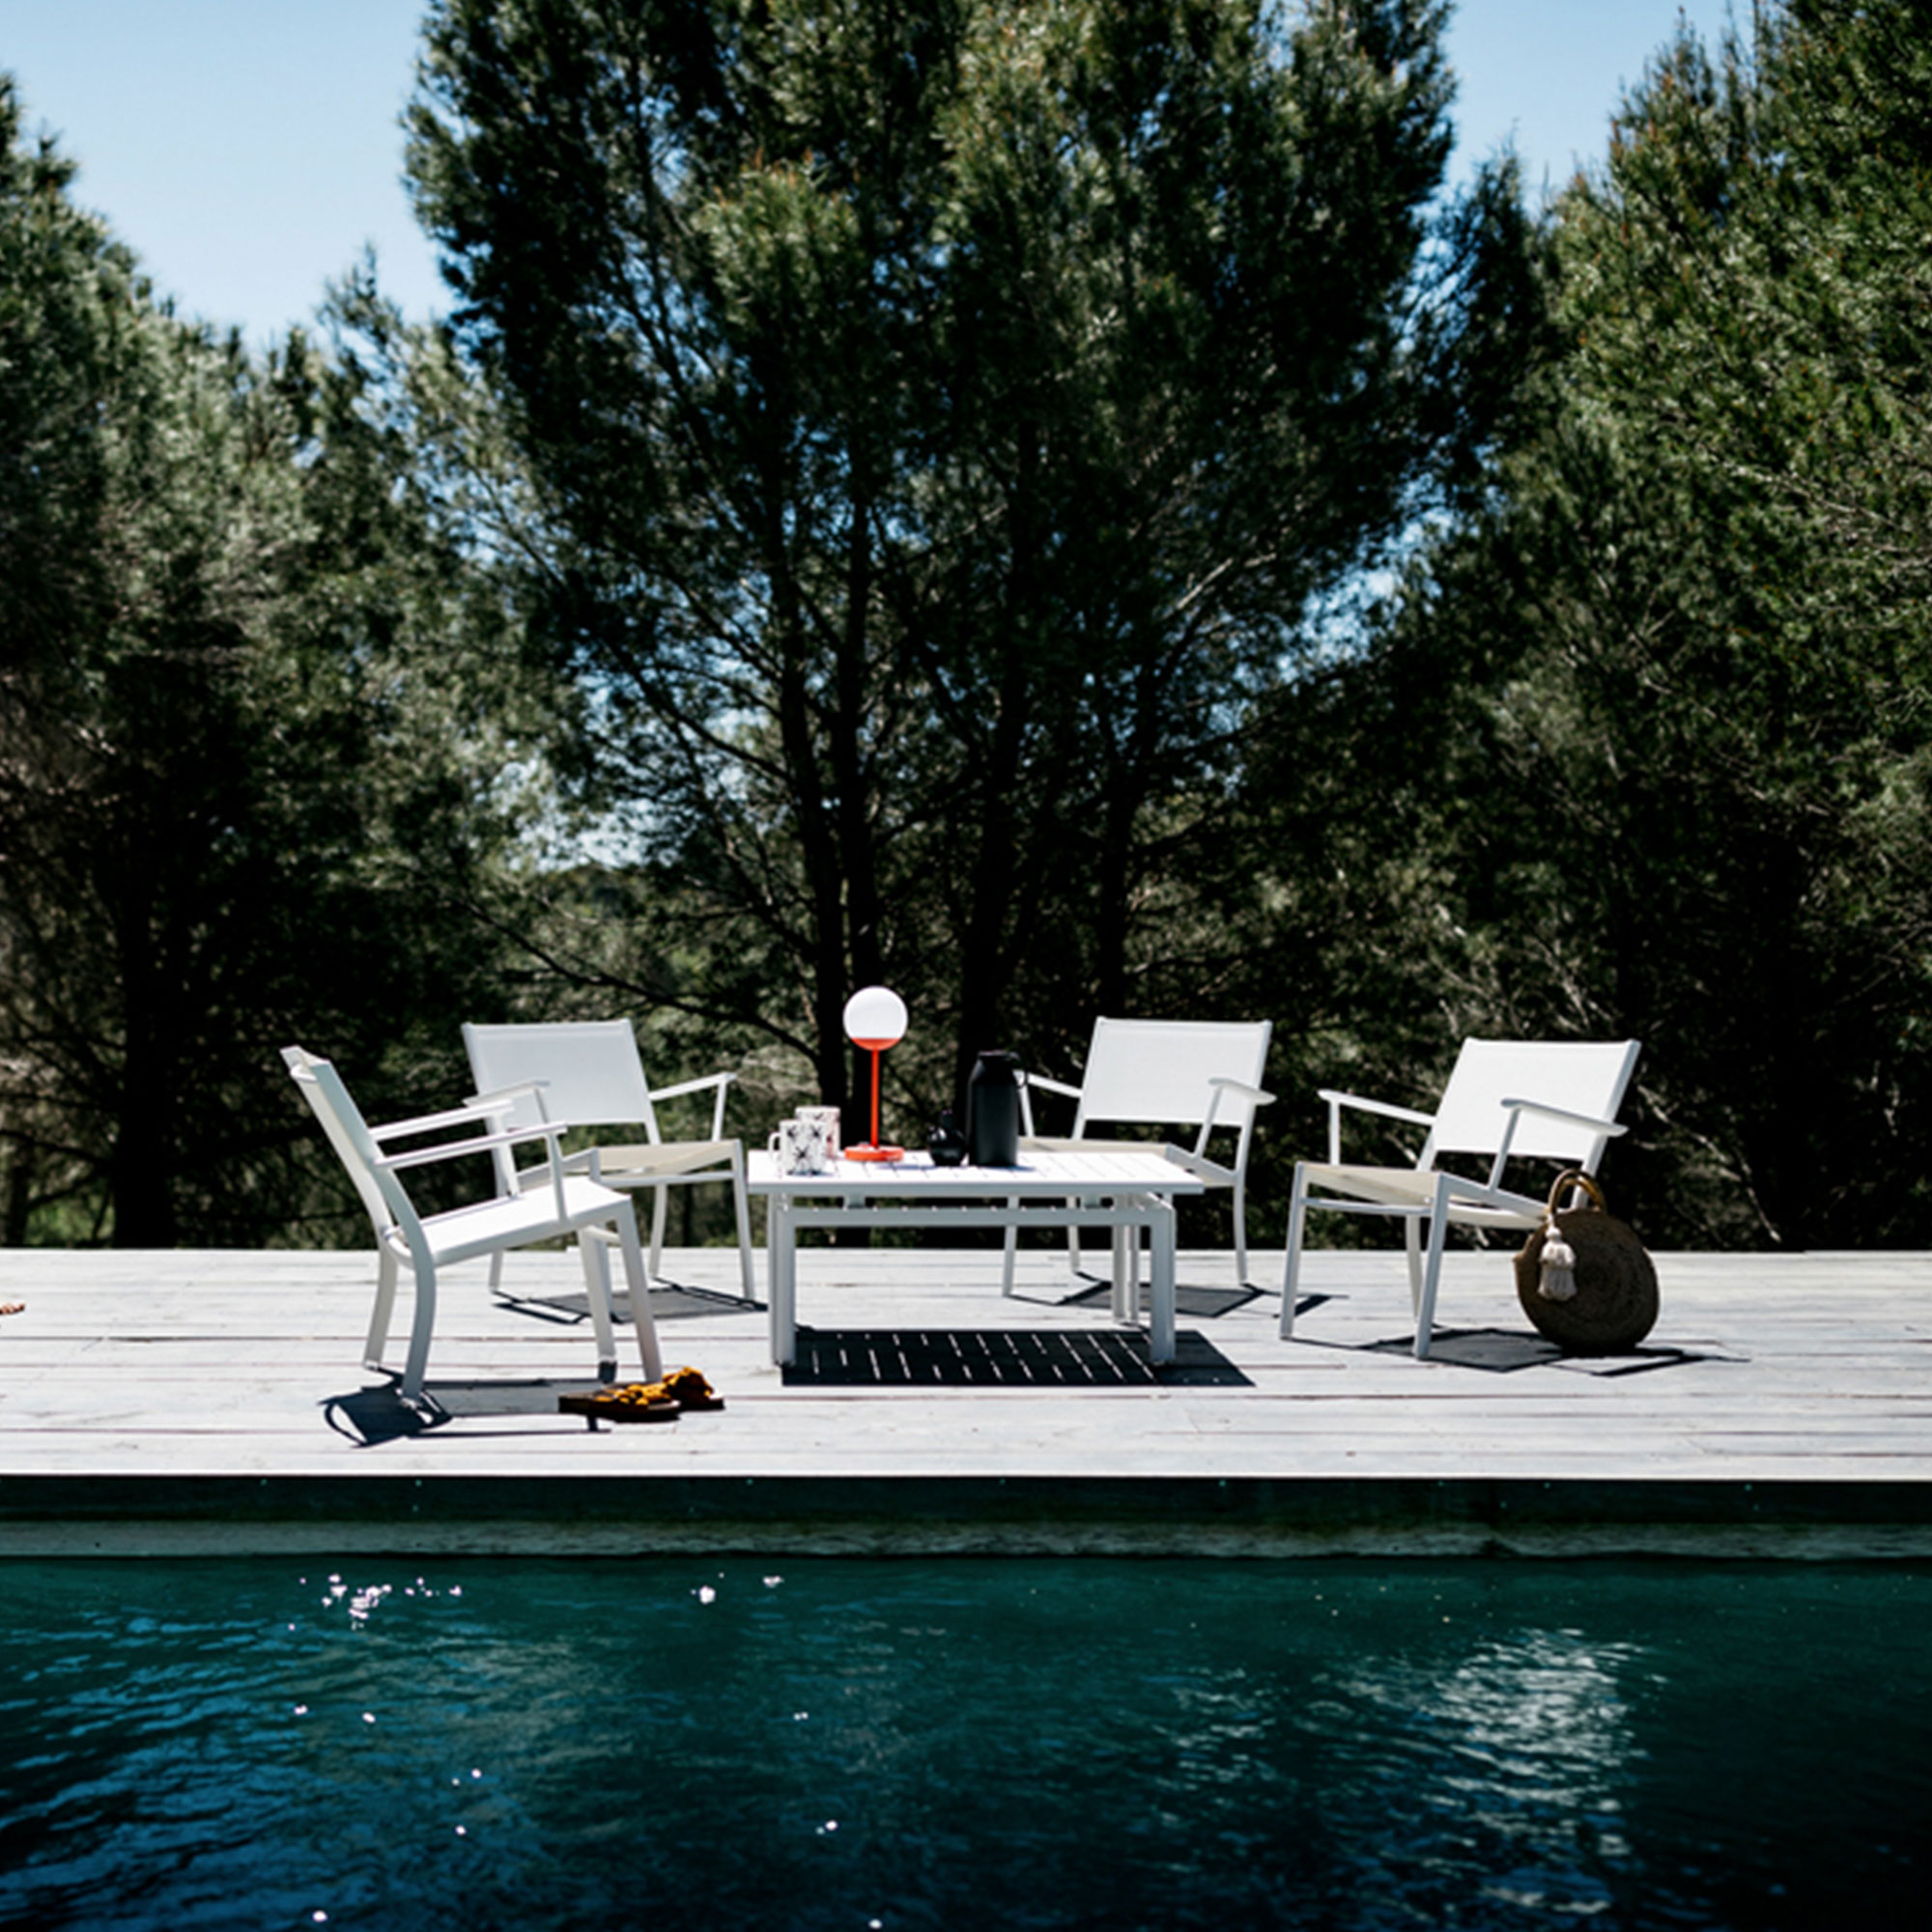 Costa Low Table 100x80 cm Acapulco Blue 21 Soffbord | Fermob